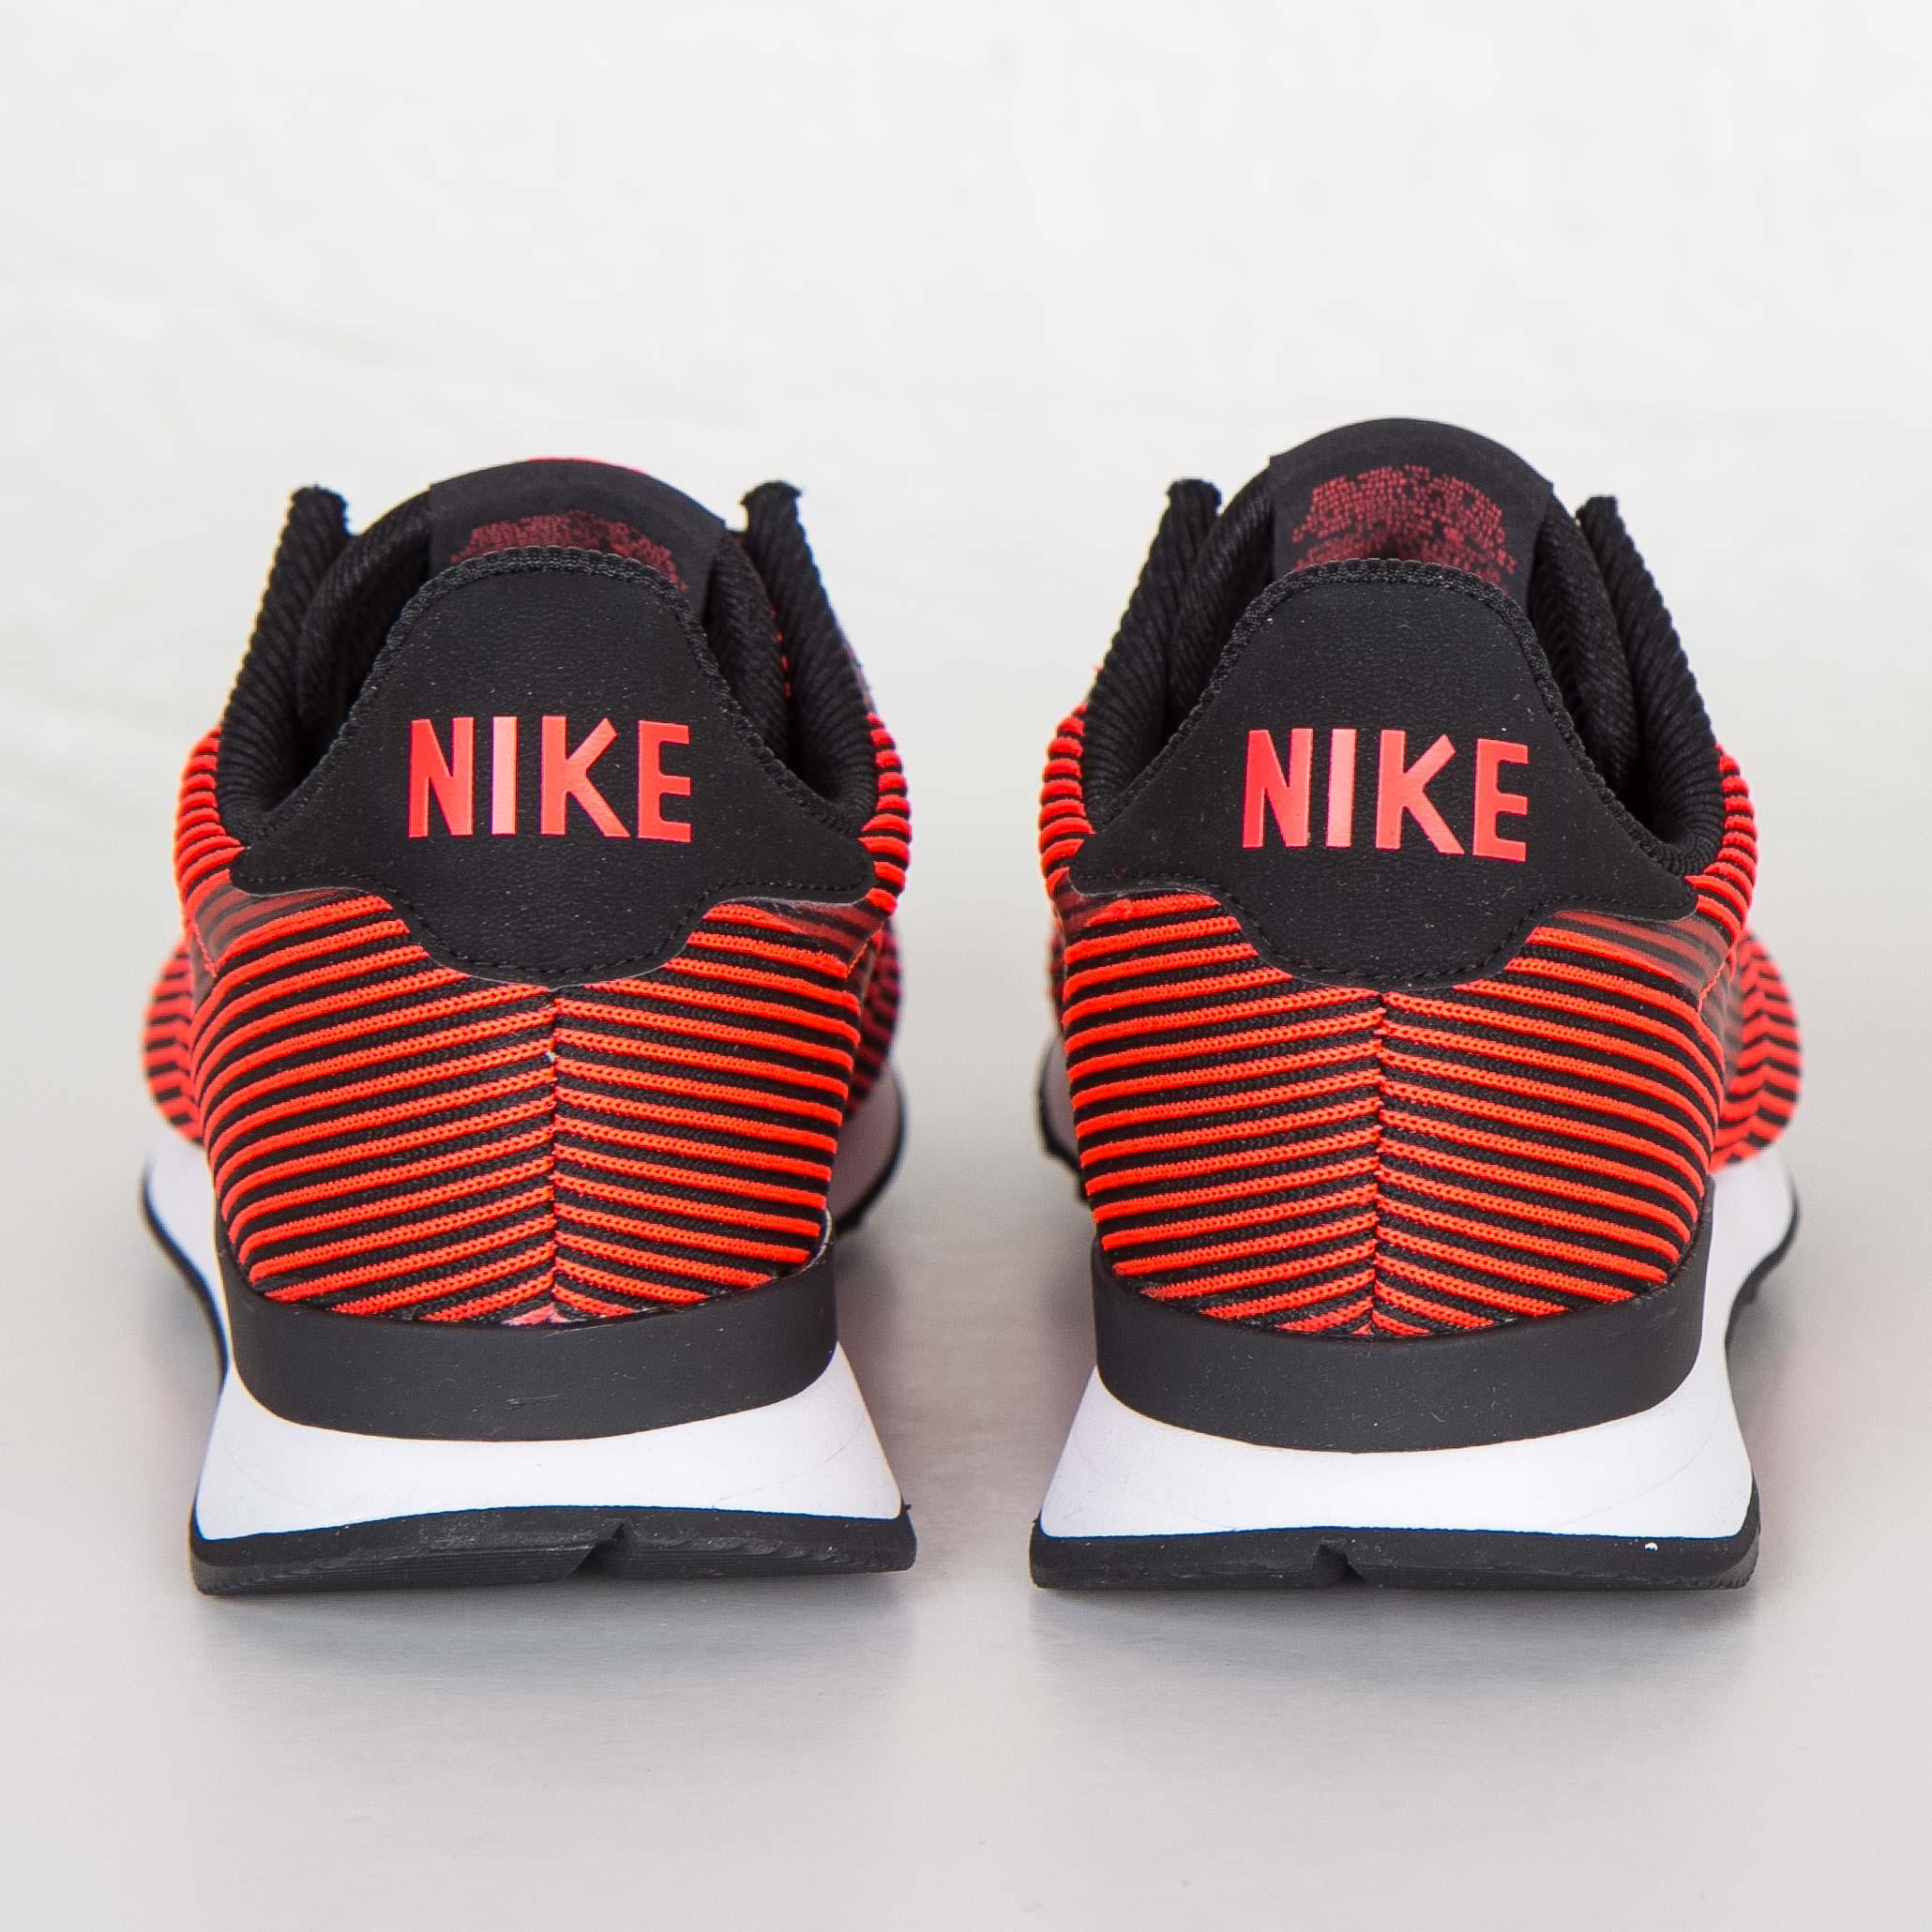 more photos c57c9 5d13f Nike Internationalist Knit Jacquard - 829344-006 - Sneakersnstuff    sneakers   streetwear online since 1999